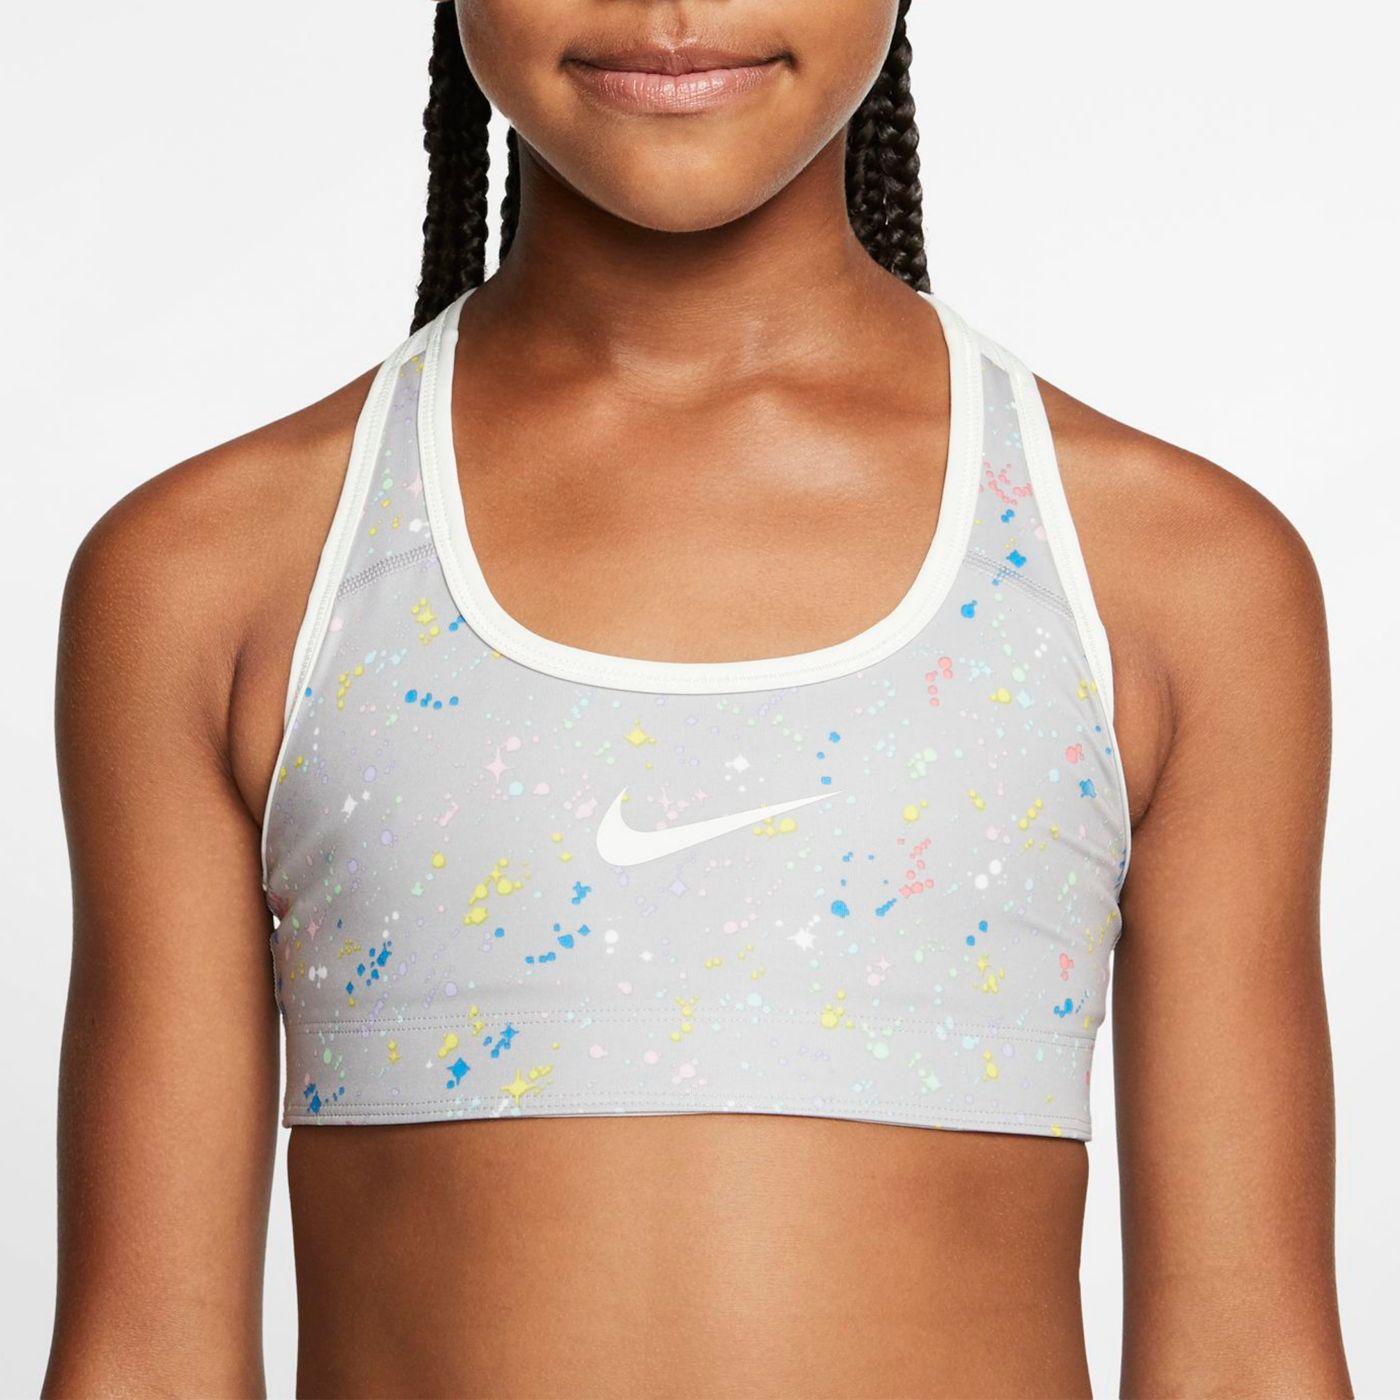 Nike Girls' Reversible Starry Night Medium Support Sports Bra